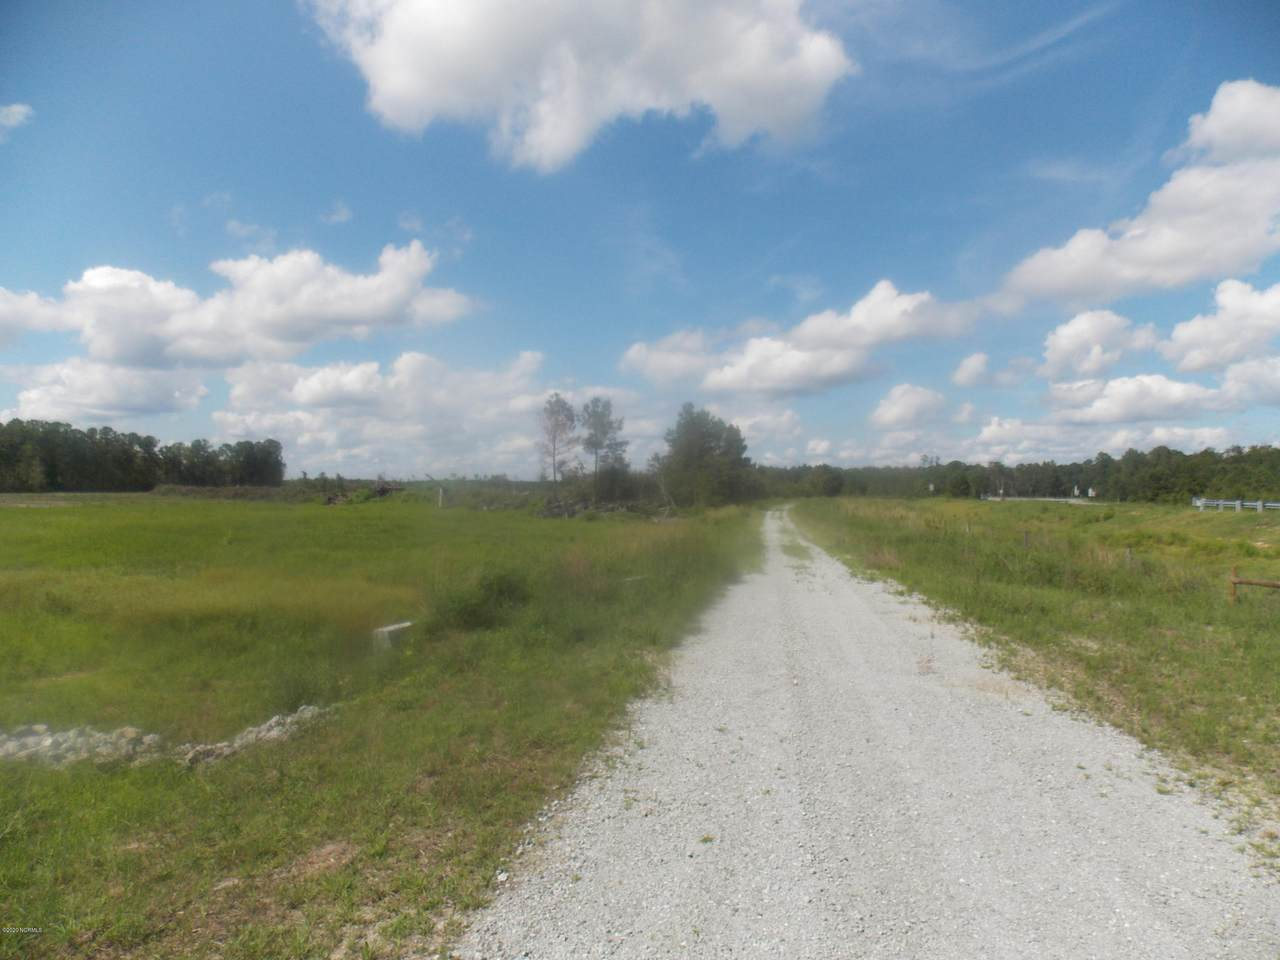 Tbd White Oak River Road - Photo 1